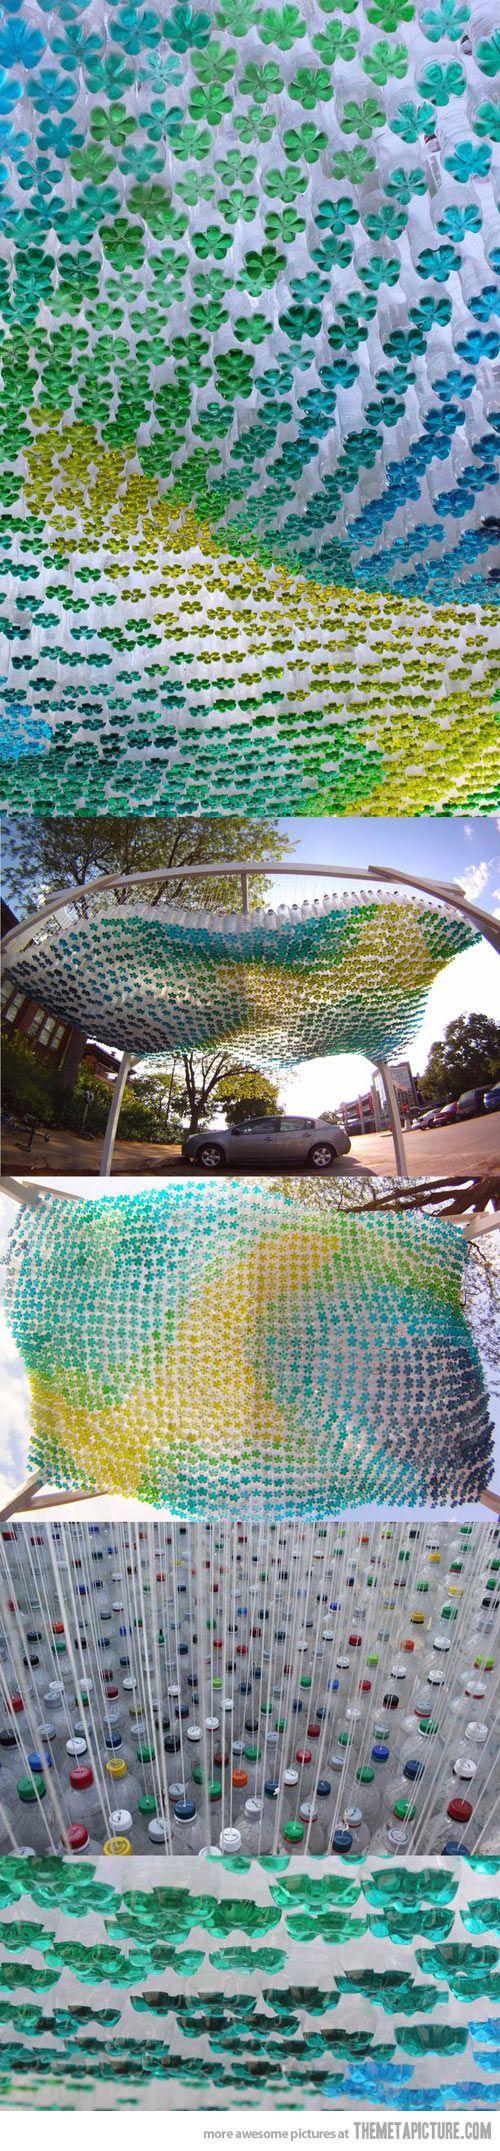 Cool sculpture using 1,581 soda bottles…